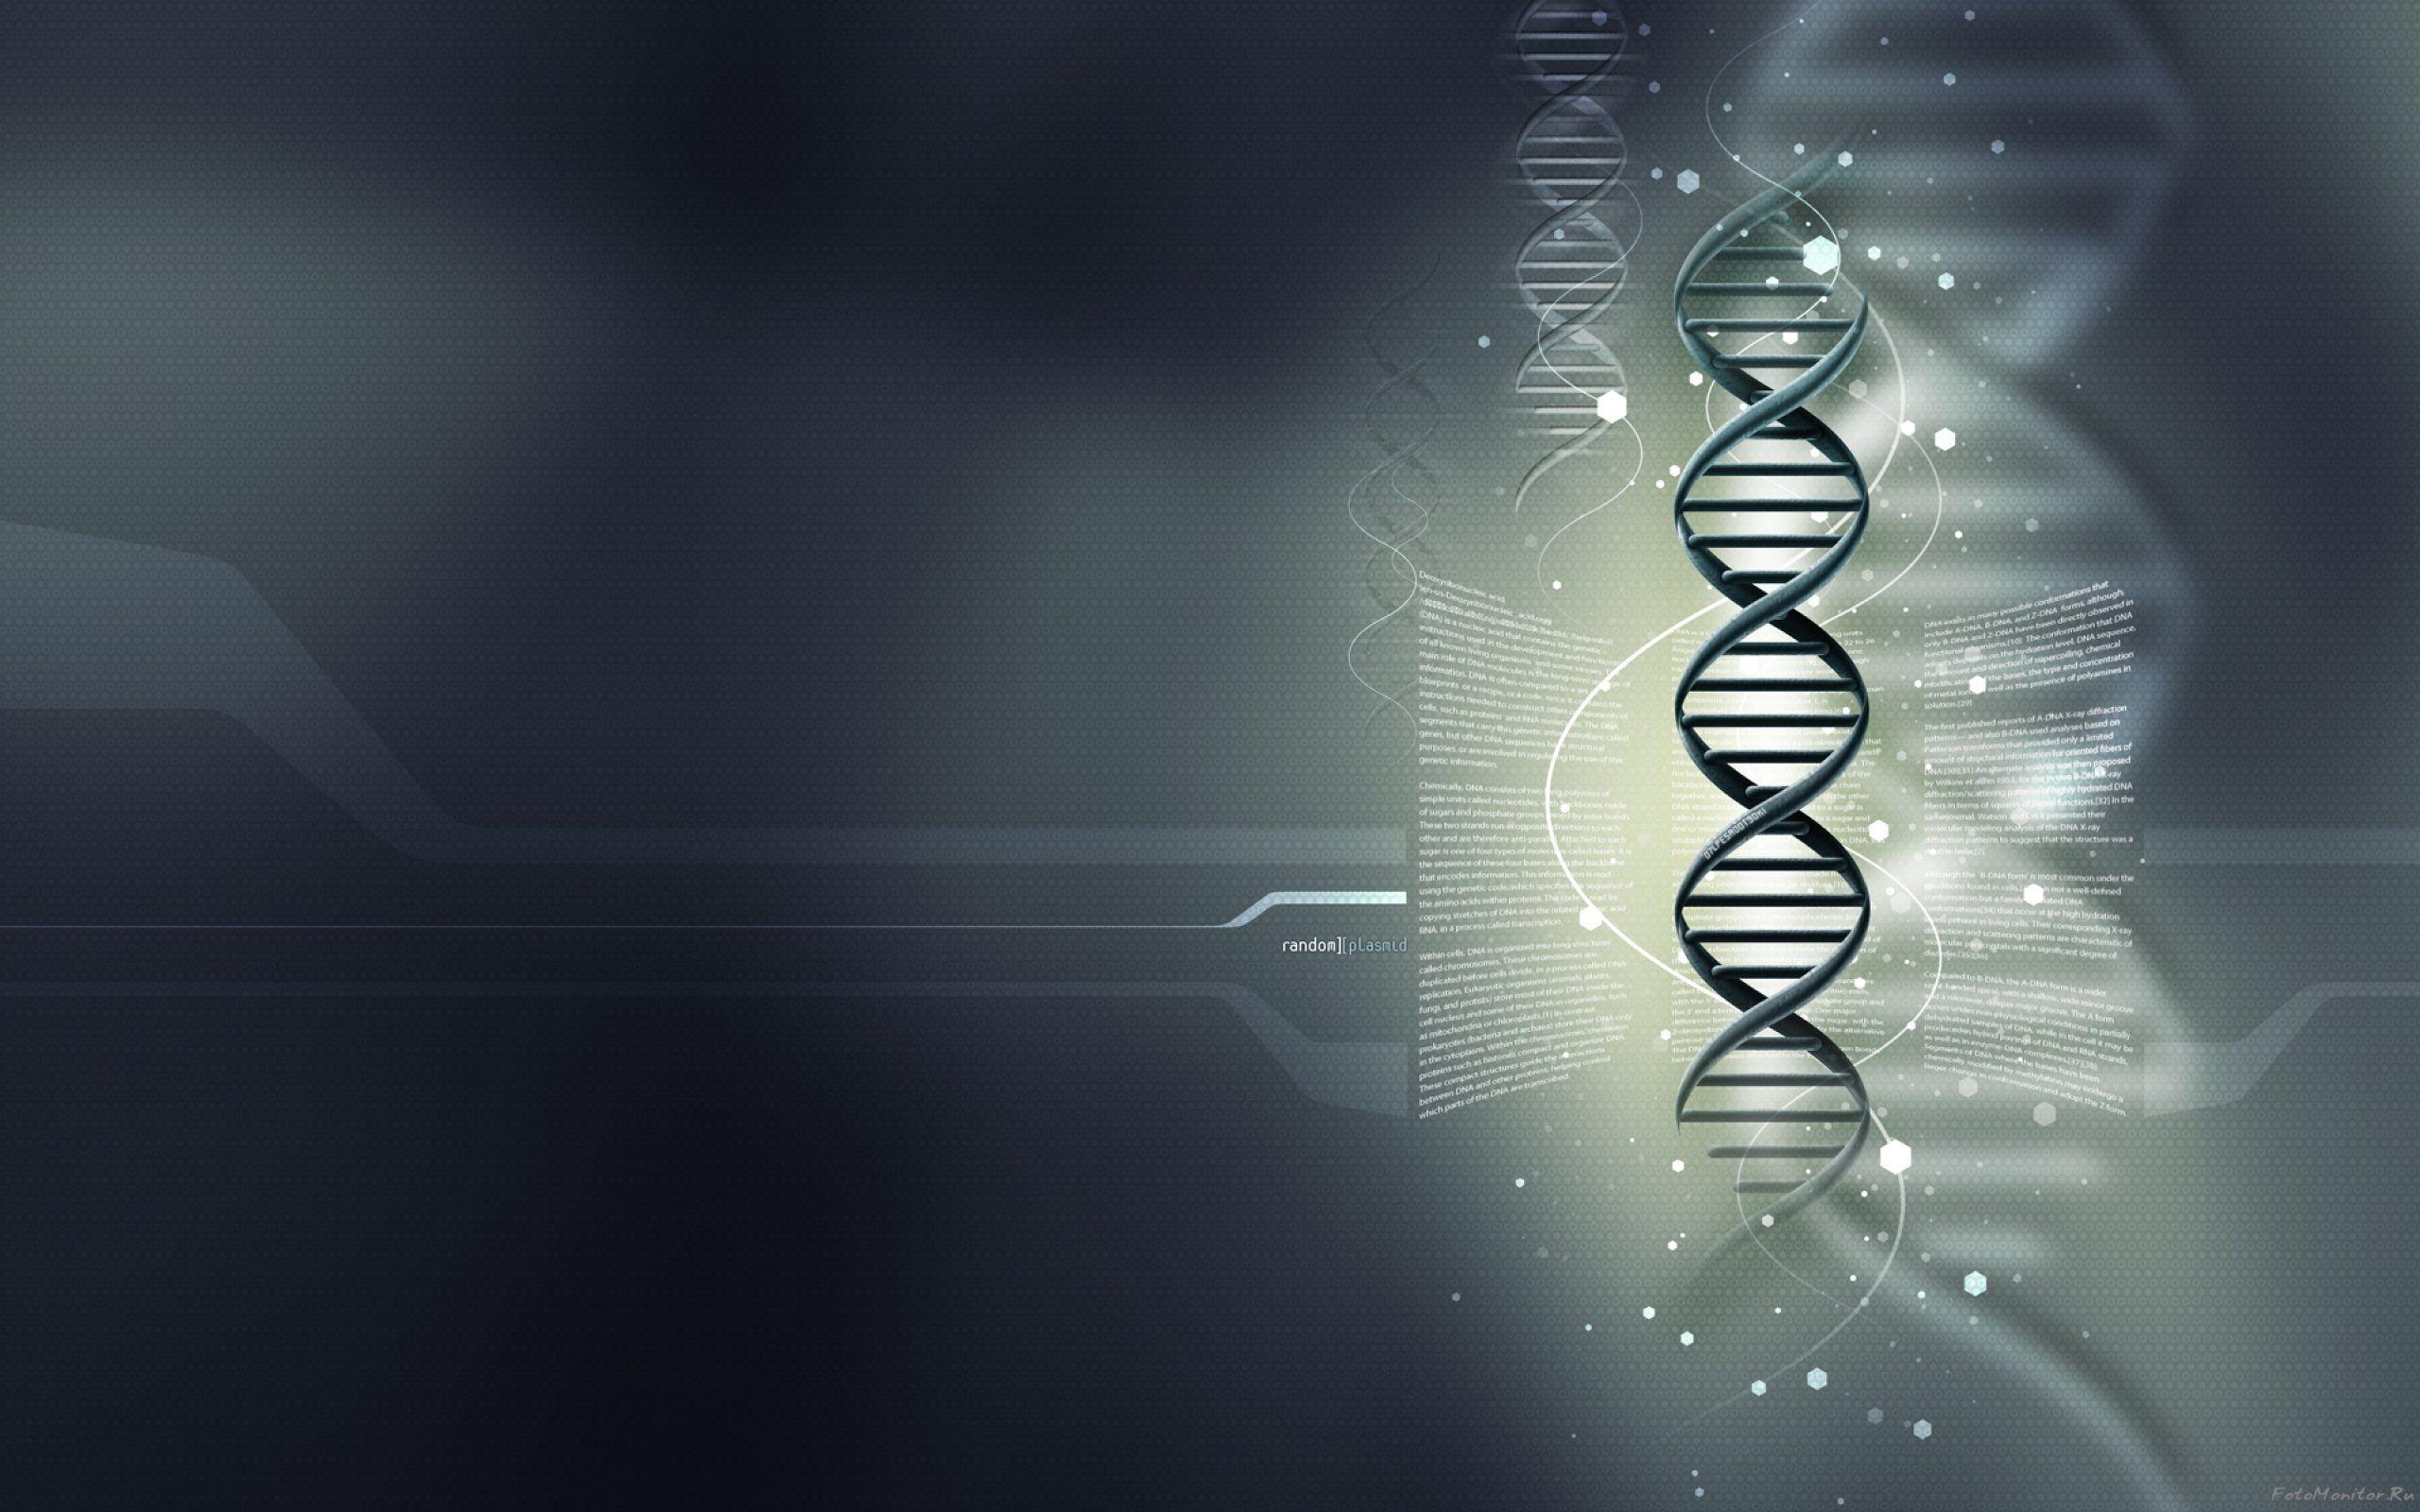 Download wallpaper gray background DNA medical wallpaper genes 2560x1600